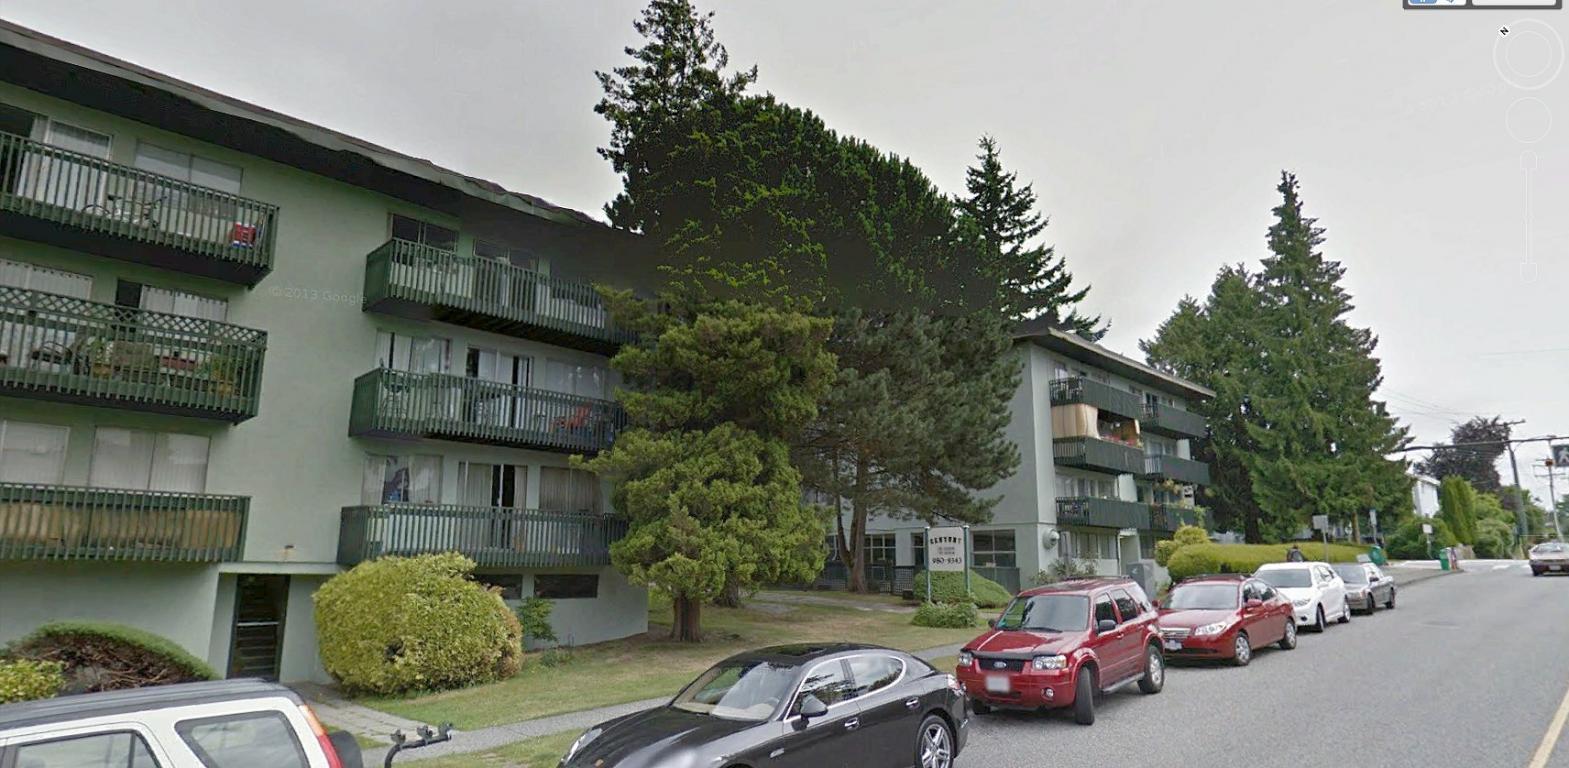 Century Apartments